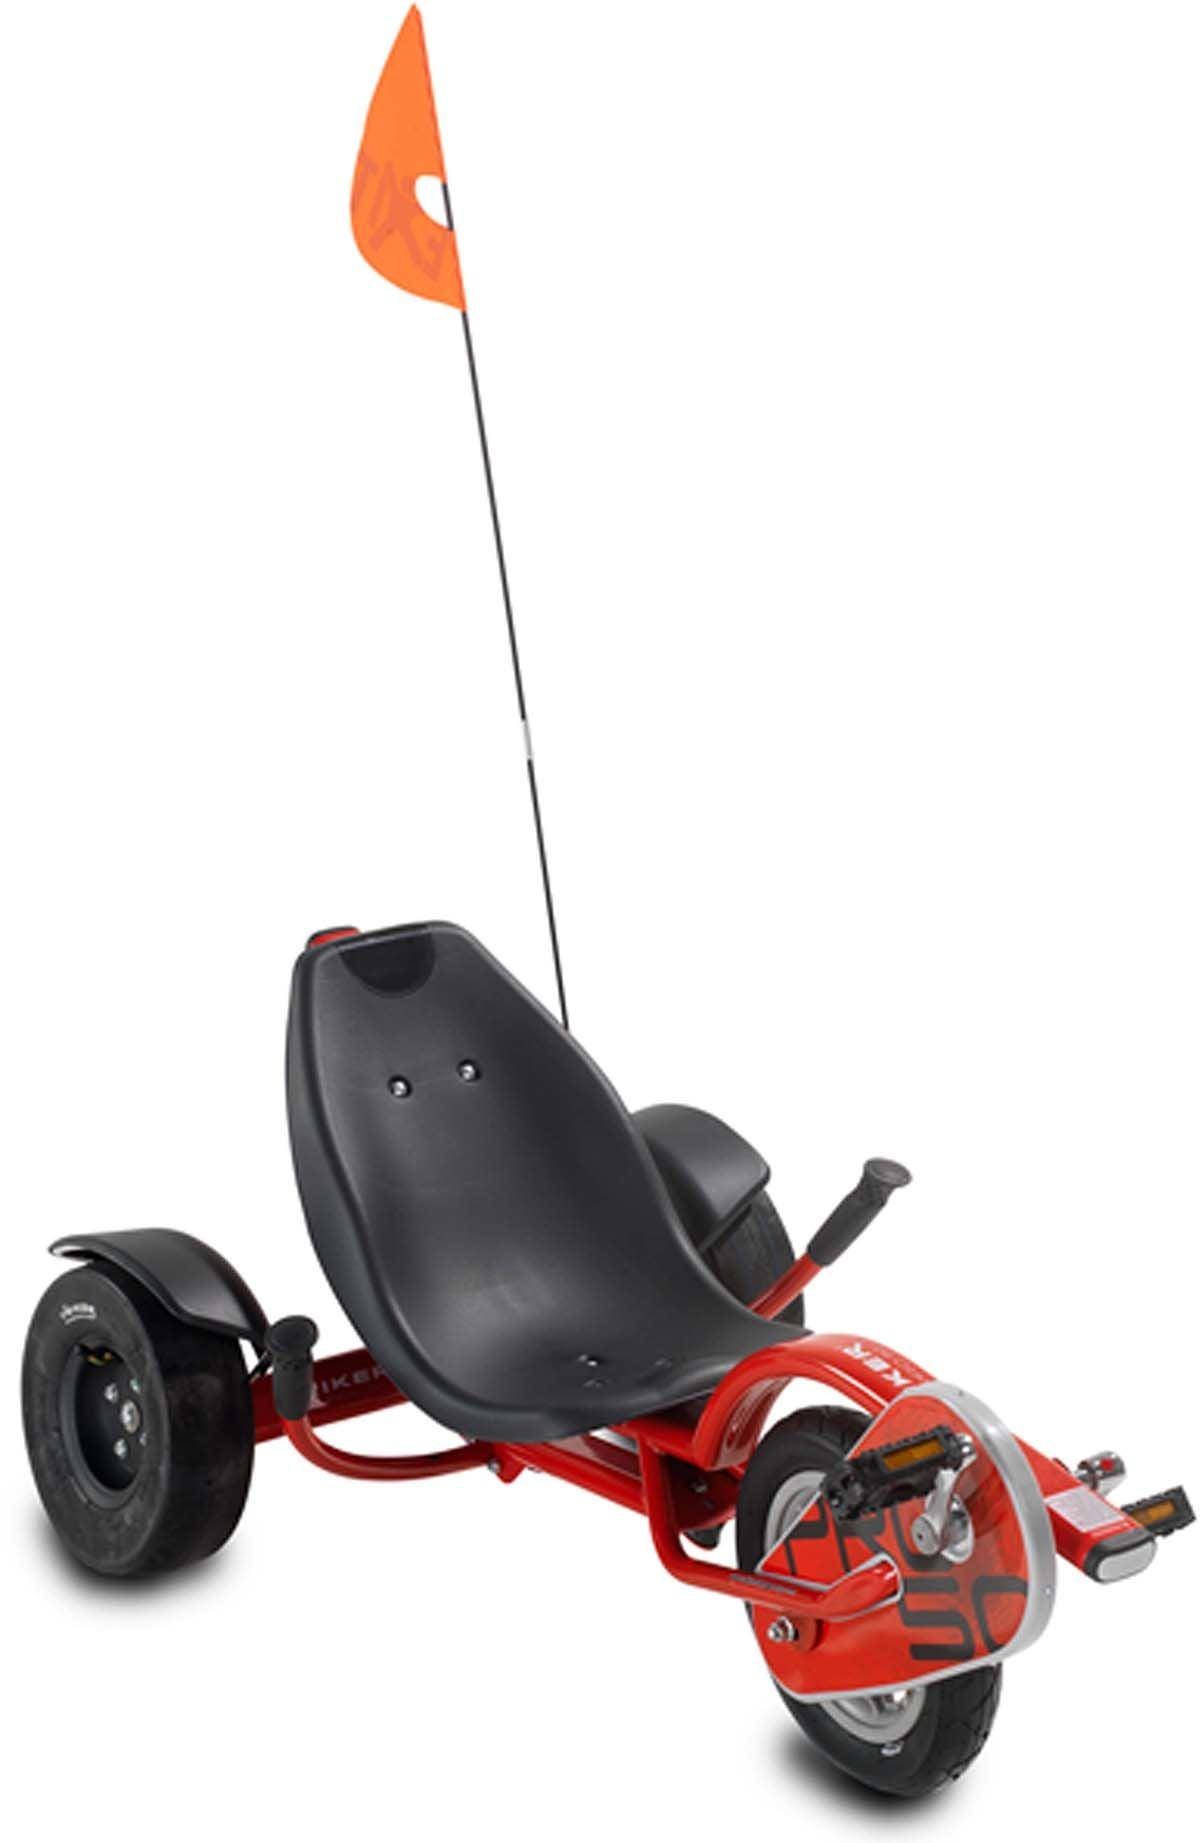 EXIT Trehjuling Triker Pro 50, Röd